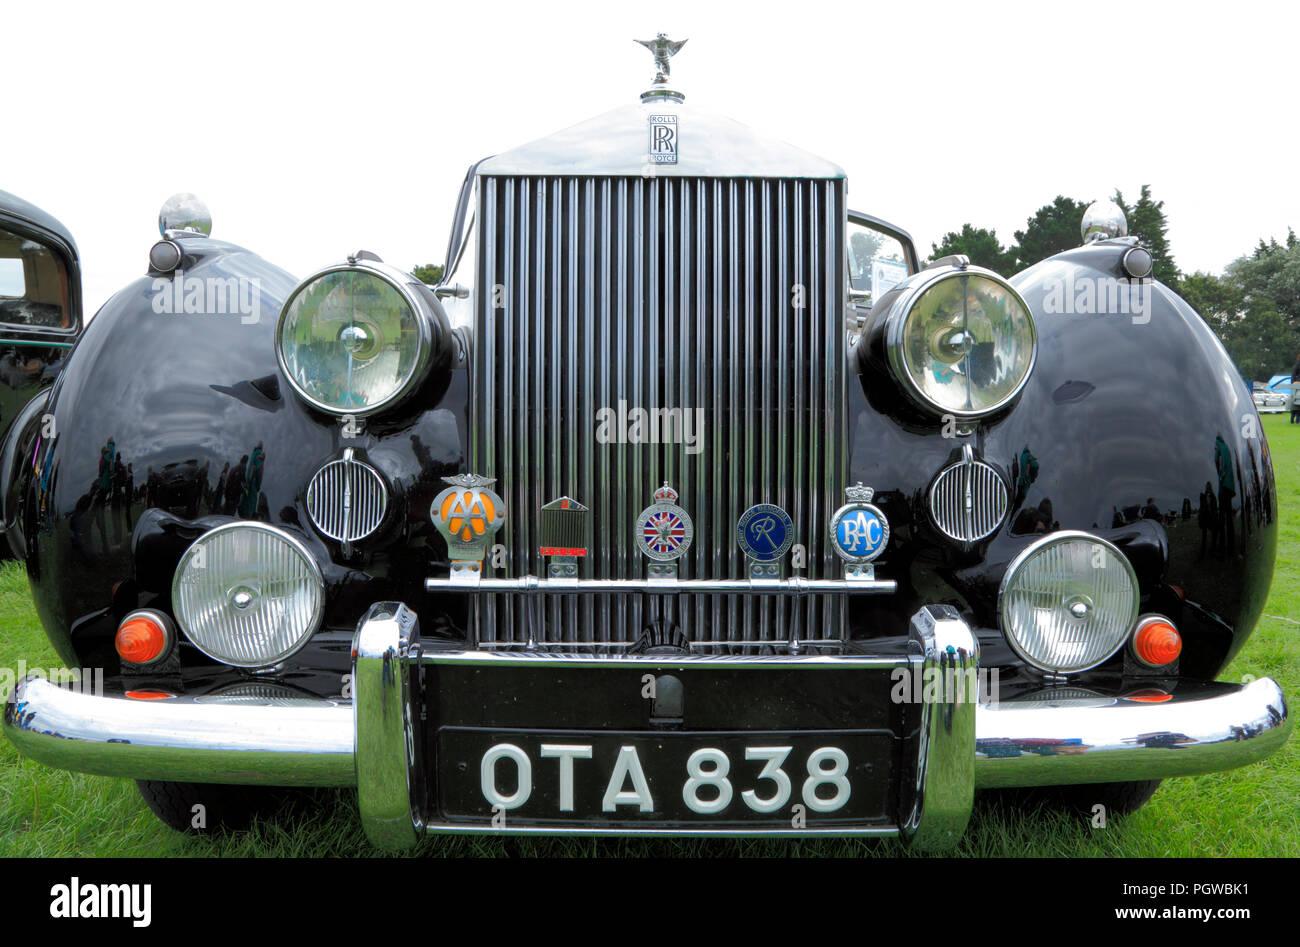 Rolls Royce Silver Dawn, Vintage, Classic, Auto, Autos, Fahrzeug, Detail, Kühler, Abzeichen, AA, RAC Stockbild